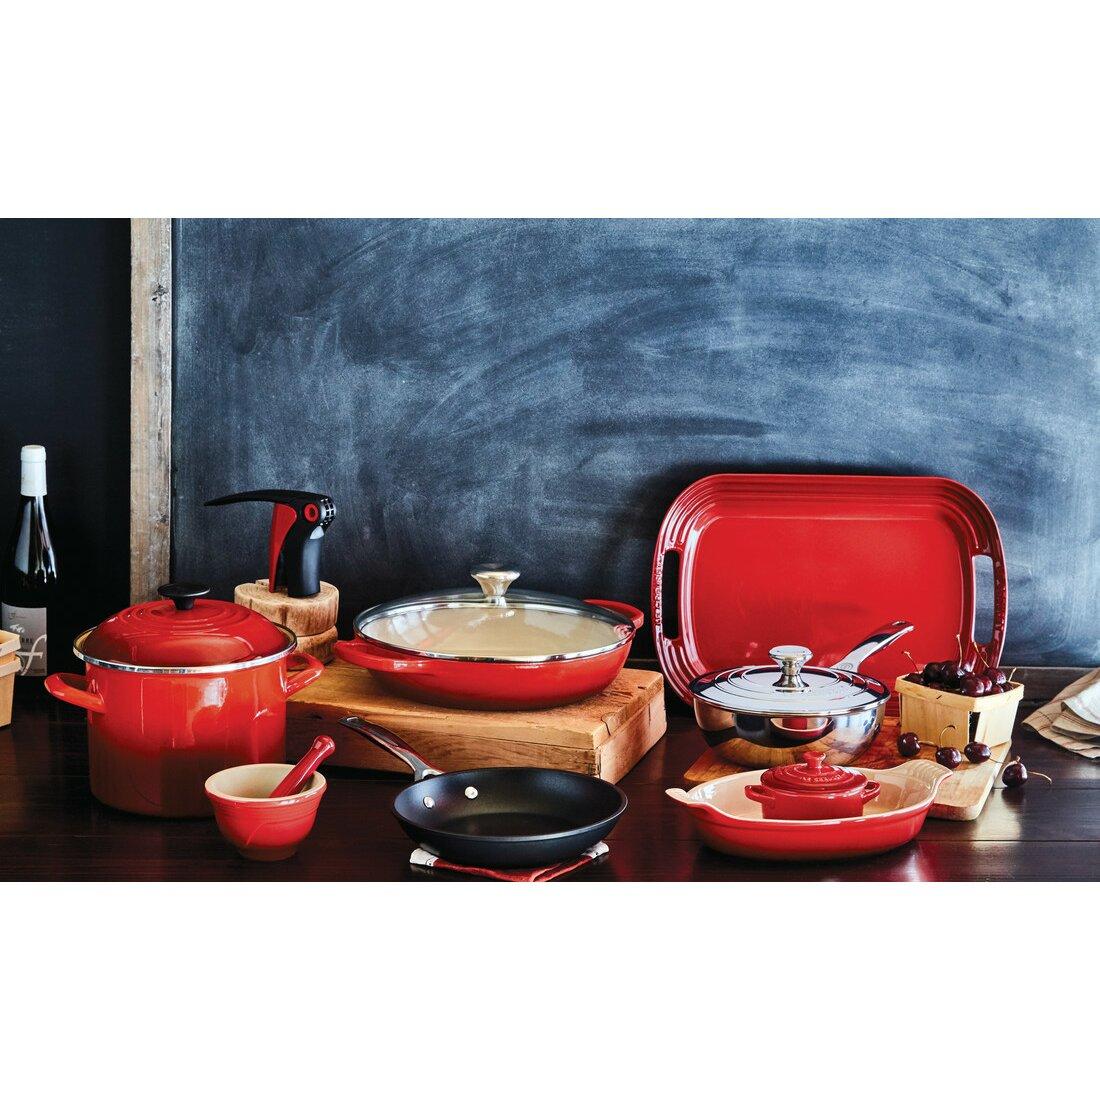 le creuset 9 nonstick frying pan reviews wayfair. Black Bedroom Furniture Sets. Home Design Ideas